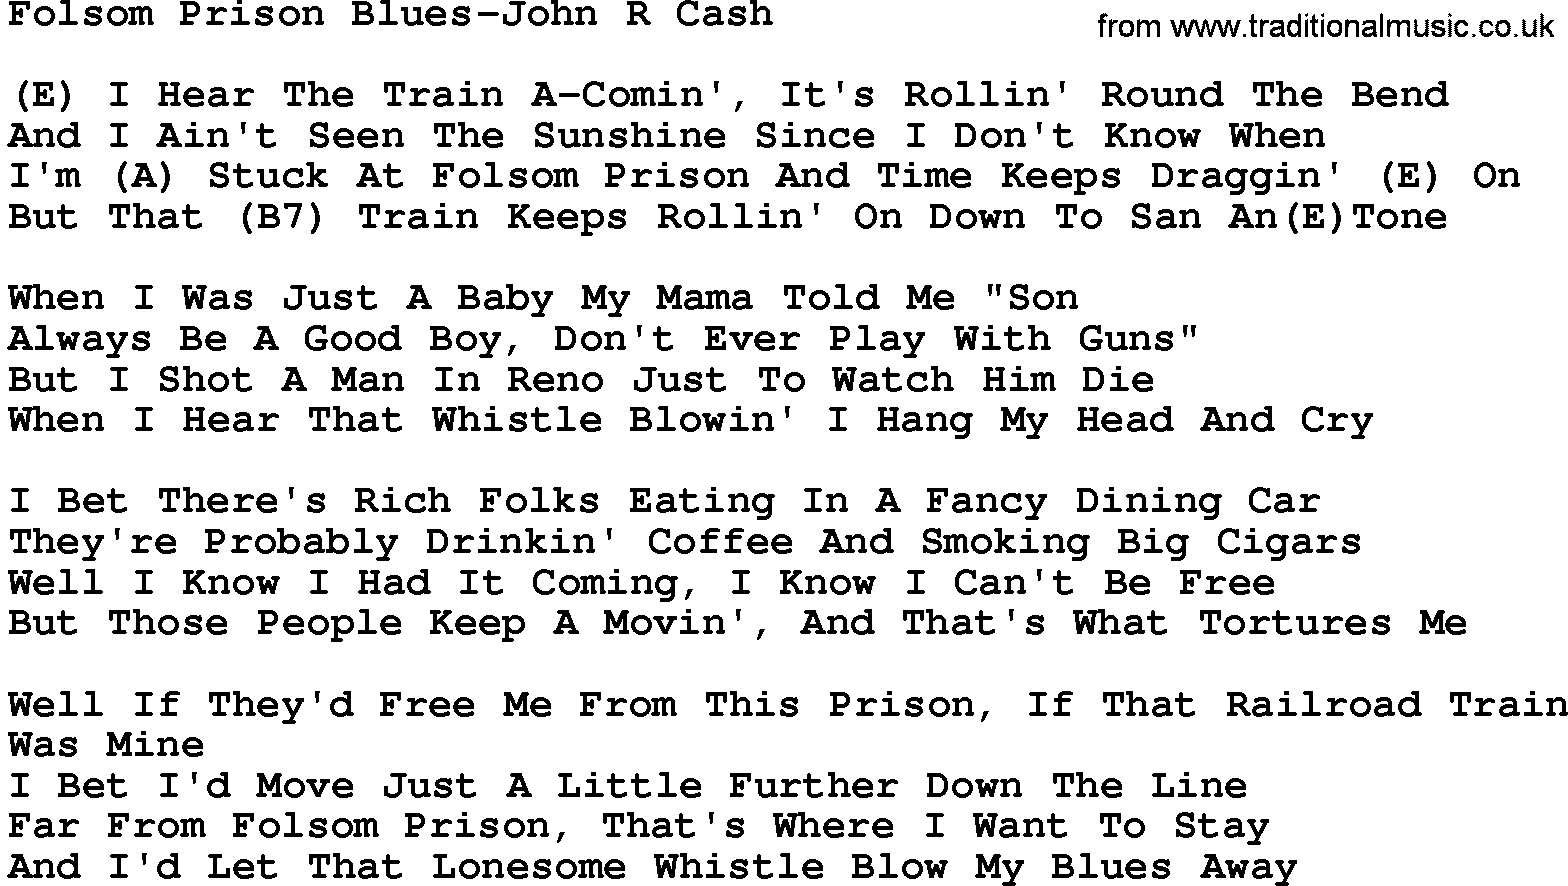 Folsom Prison Blues Chords Country Musicfolsom Prison Blues John R Cash Lyrics And Chords